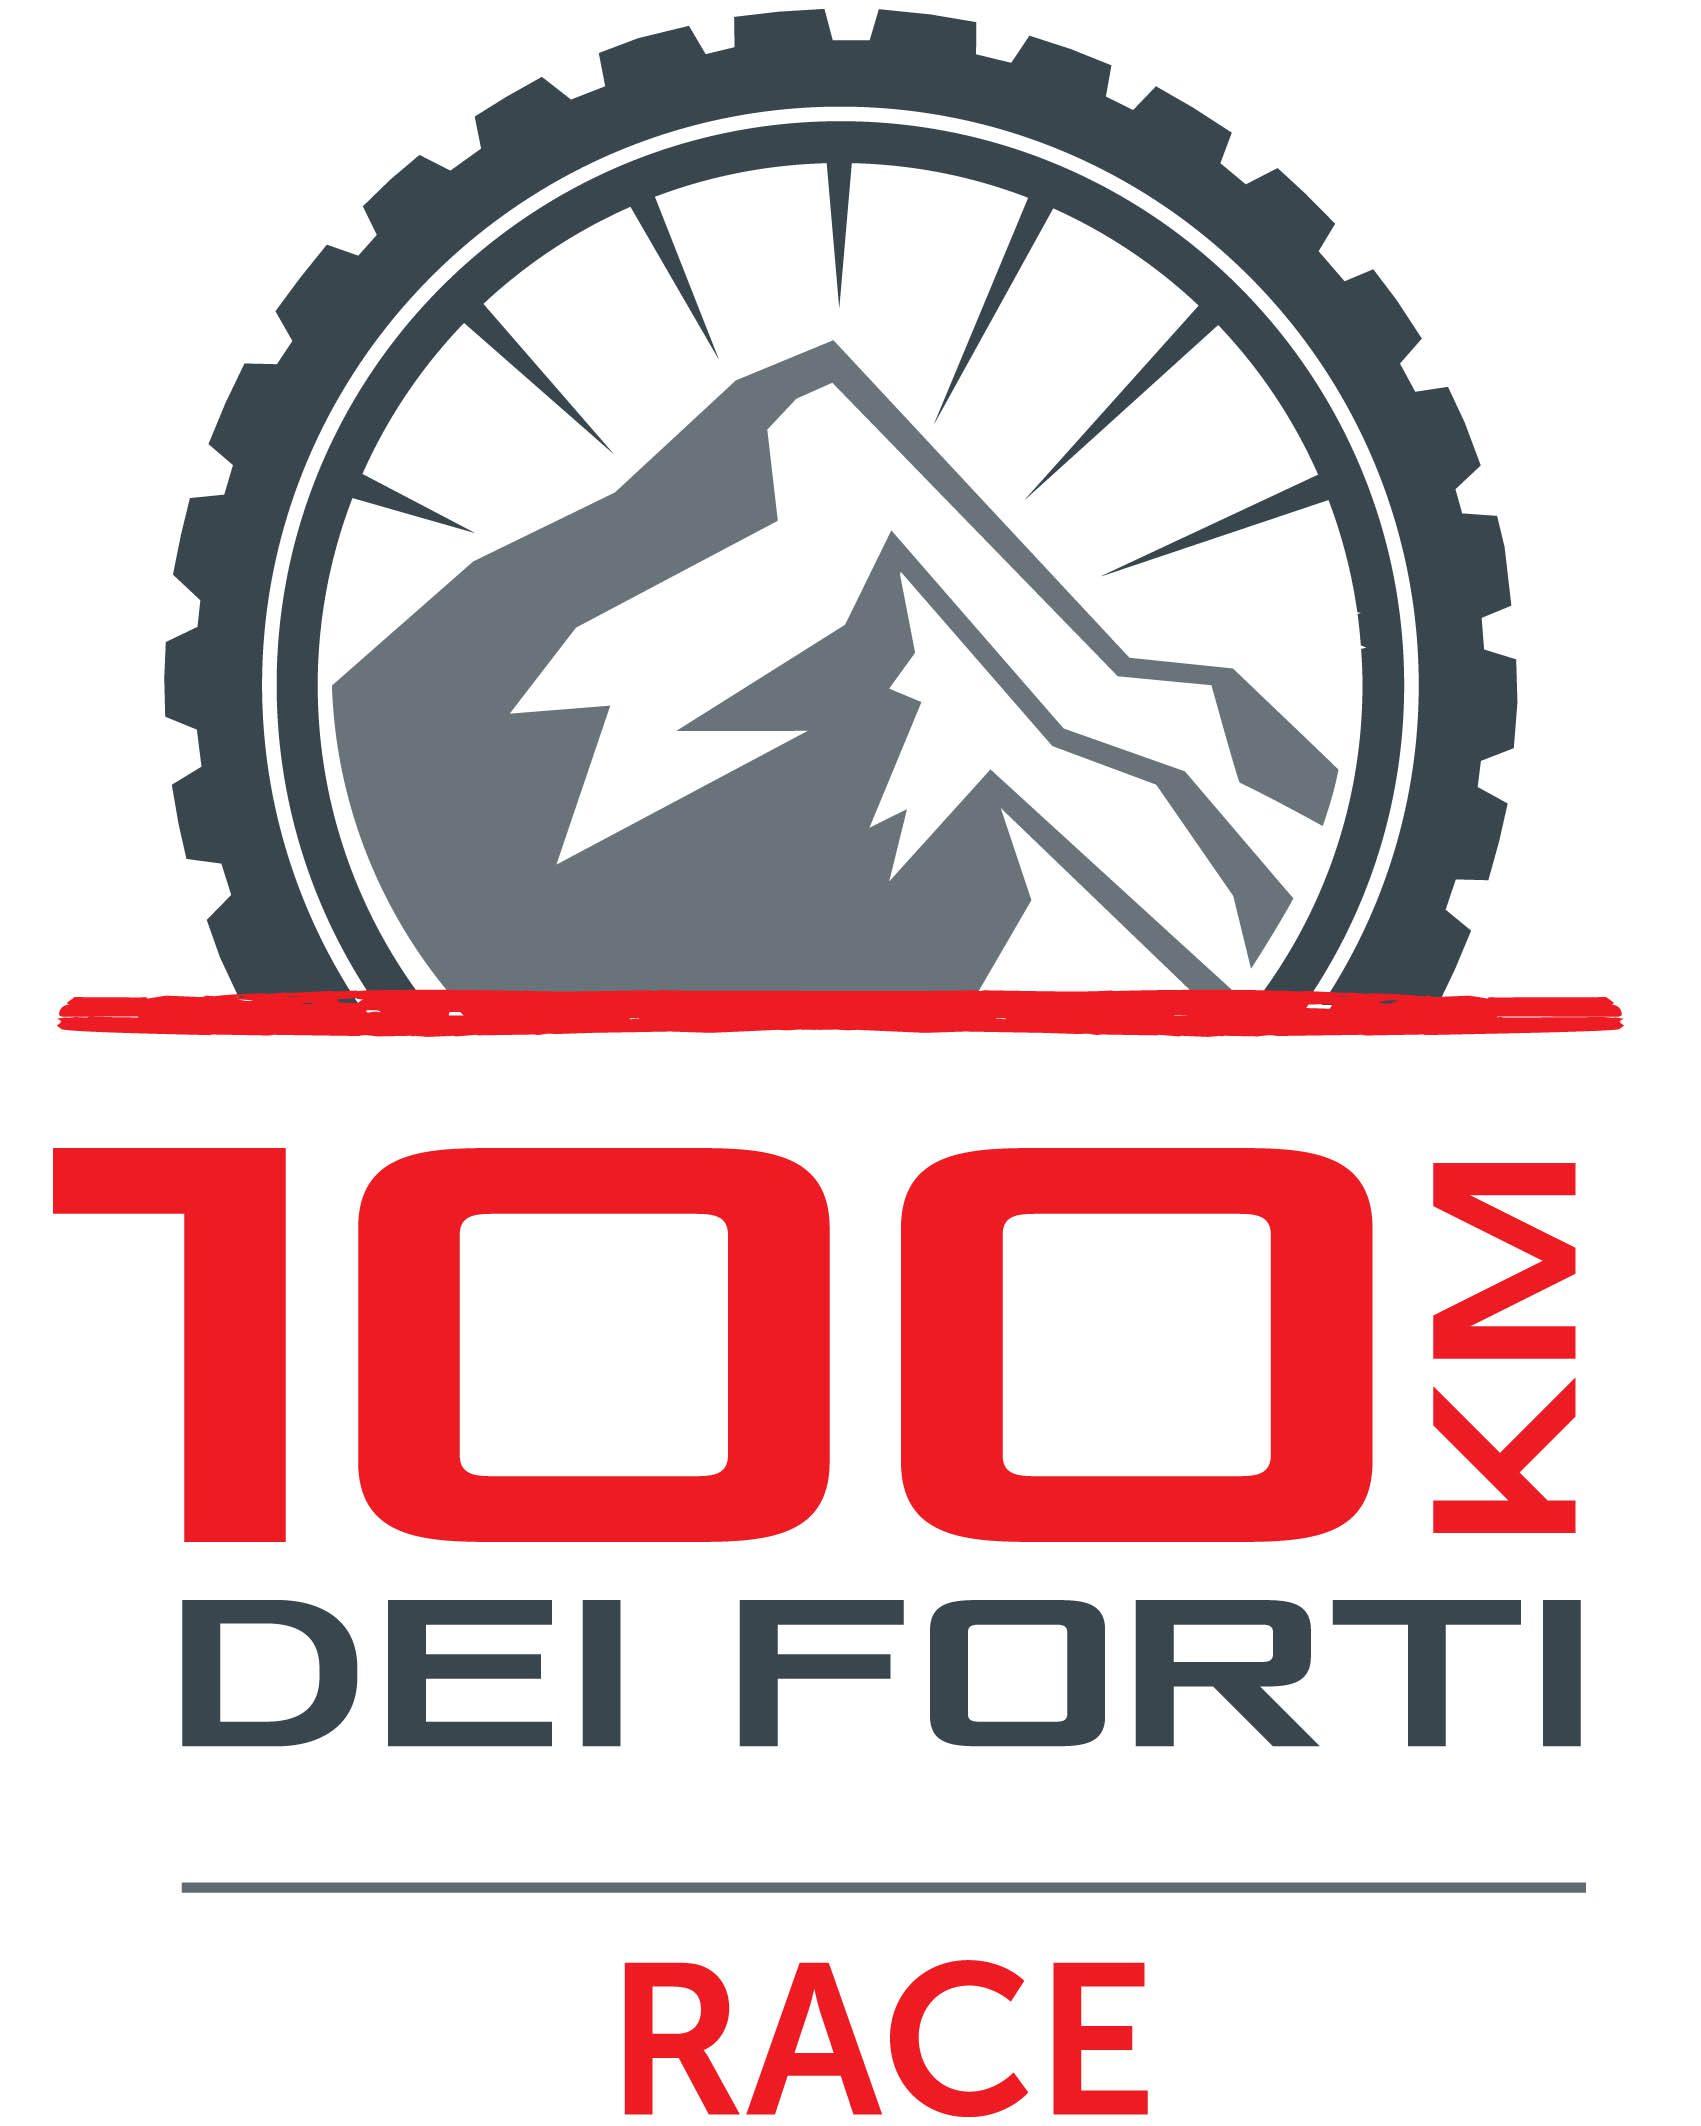 09_FLL_100KM-Race_14apr15